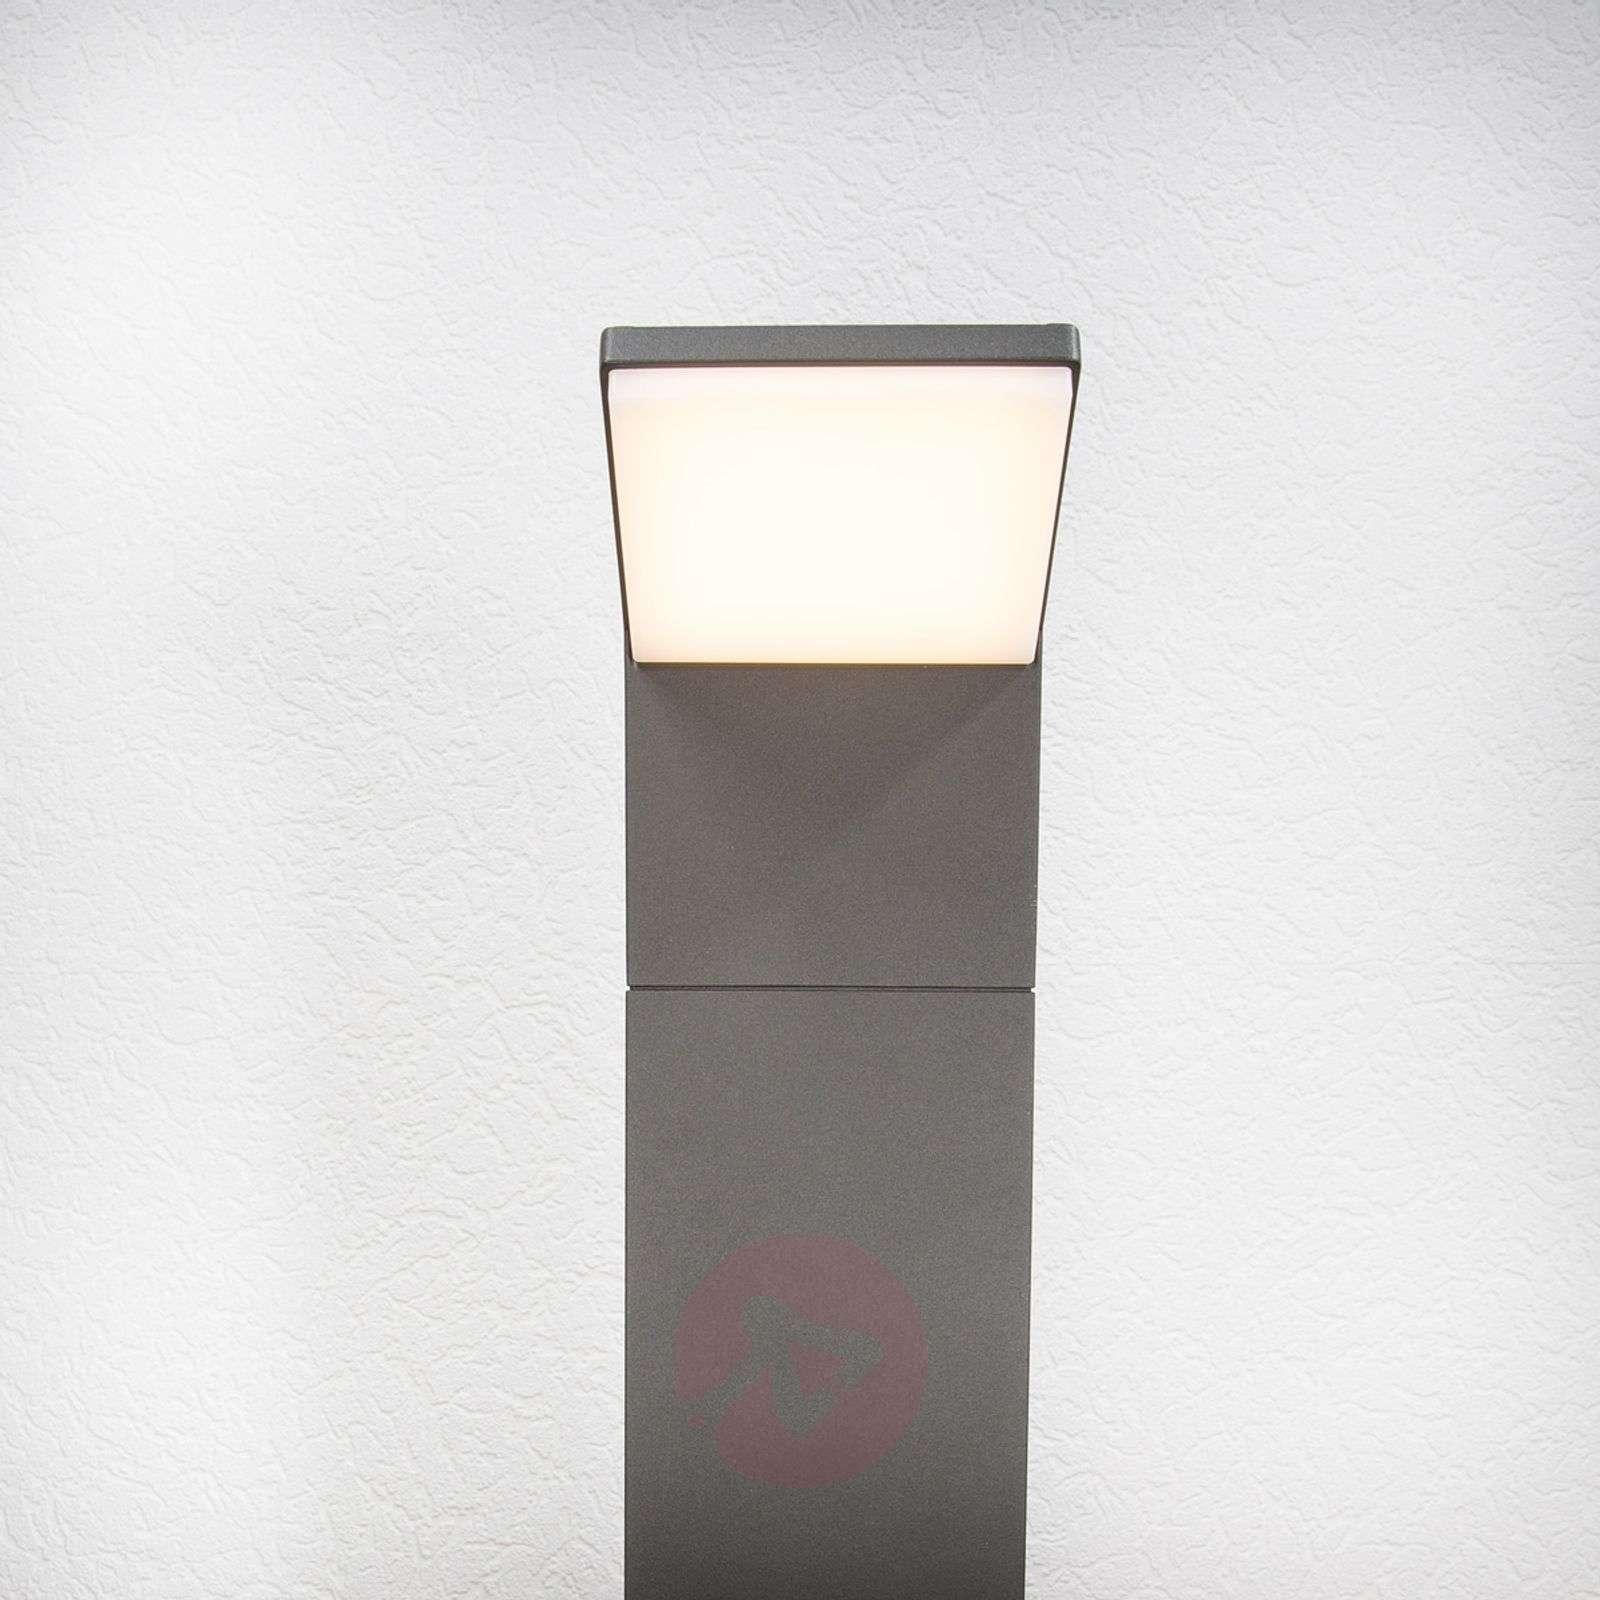 Nevio-LED-pylväsvalaisin 60 cm-9619041-01